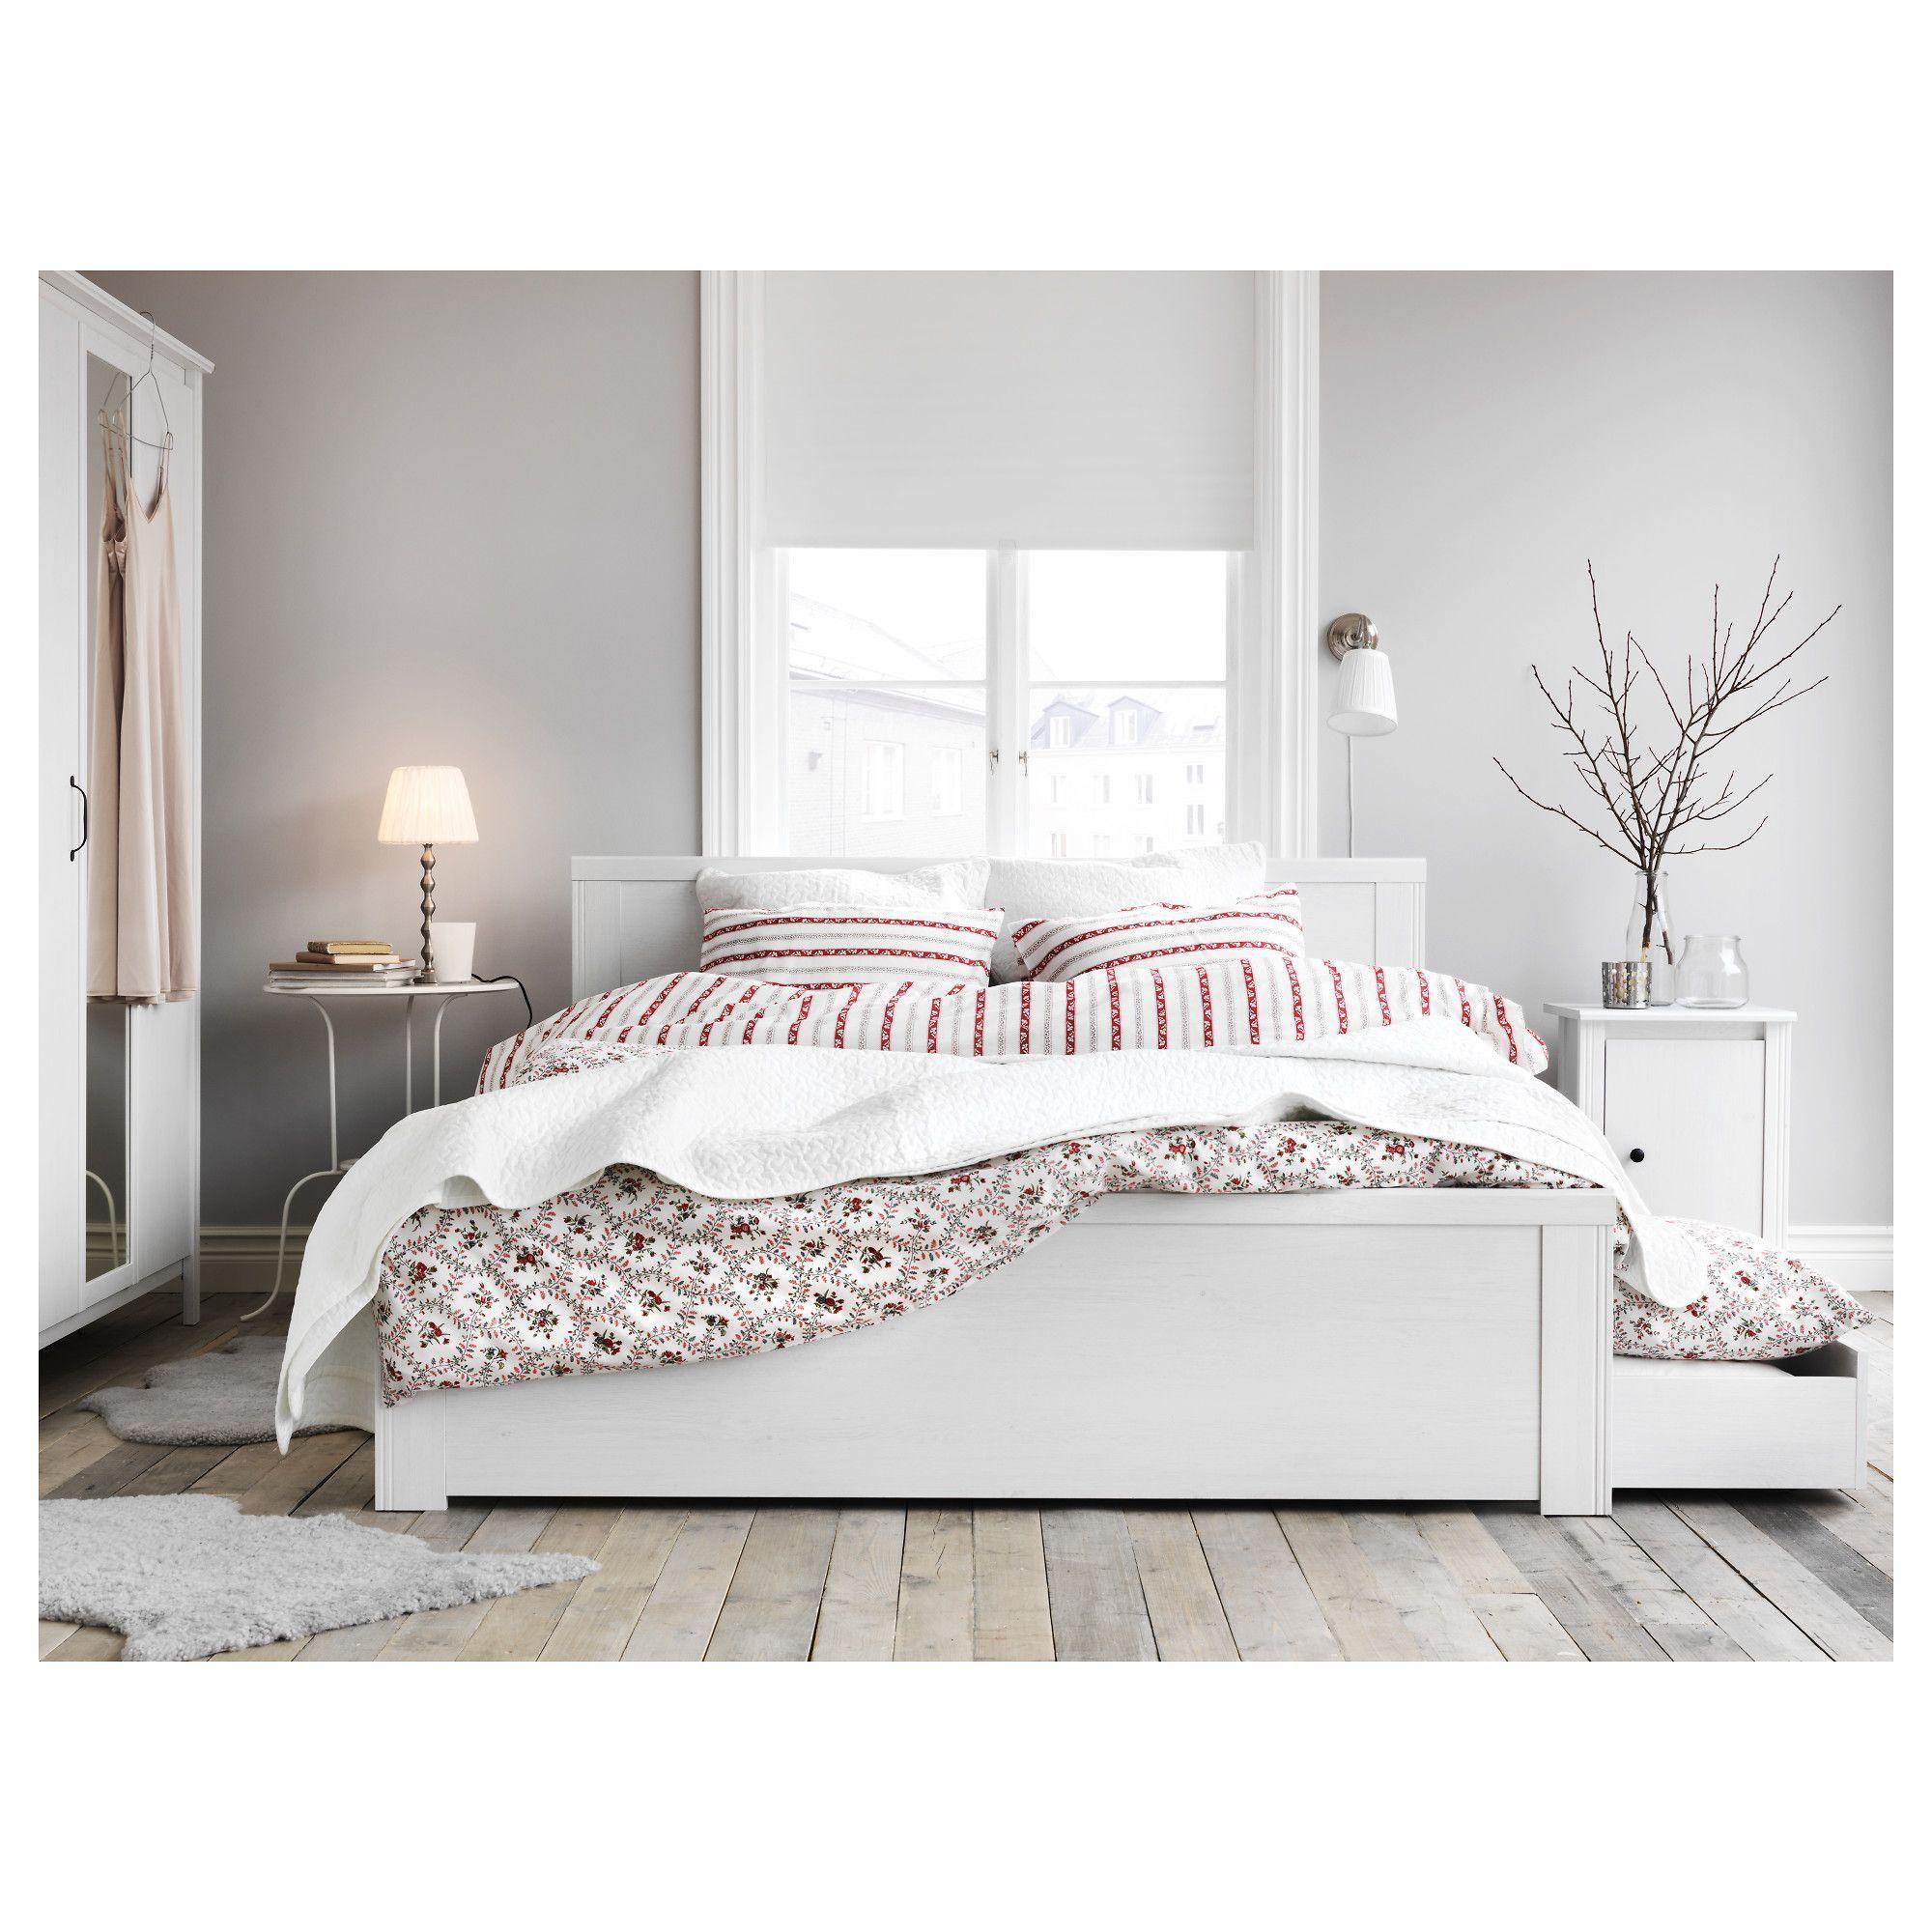 Ikea Brusali Bed Frame With 4 Storage Boxes Soverom Inspirasjon Baderomsmobler Ikea Seng